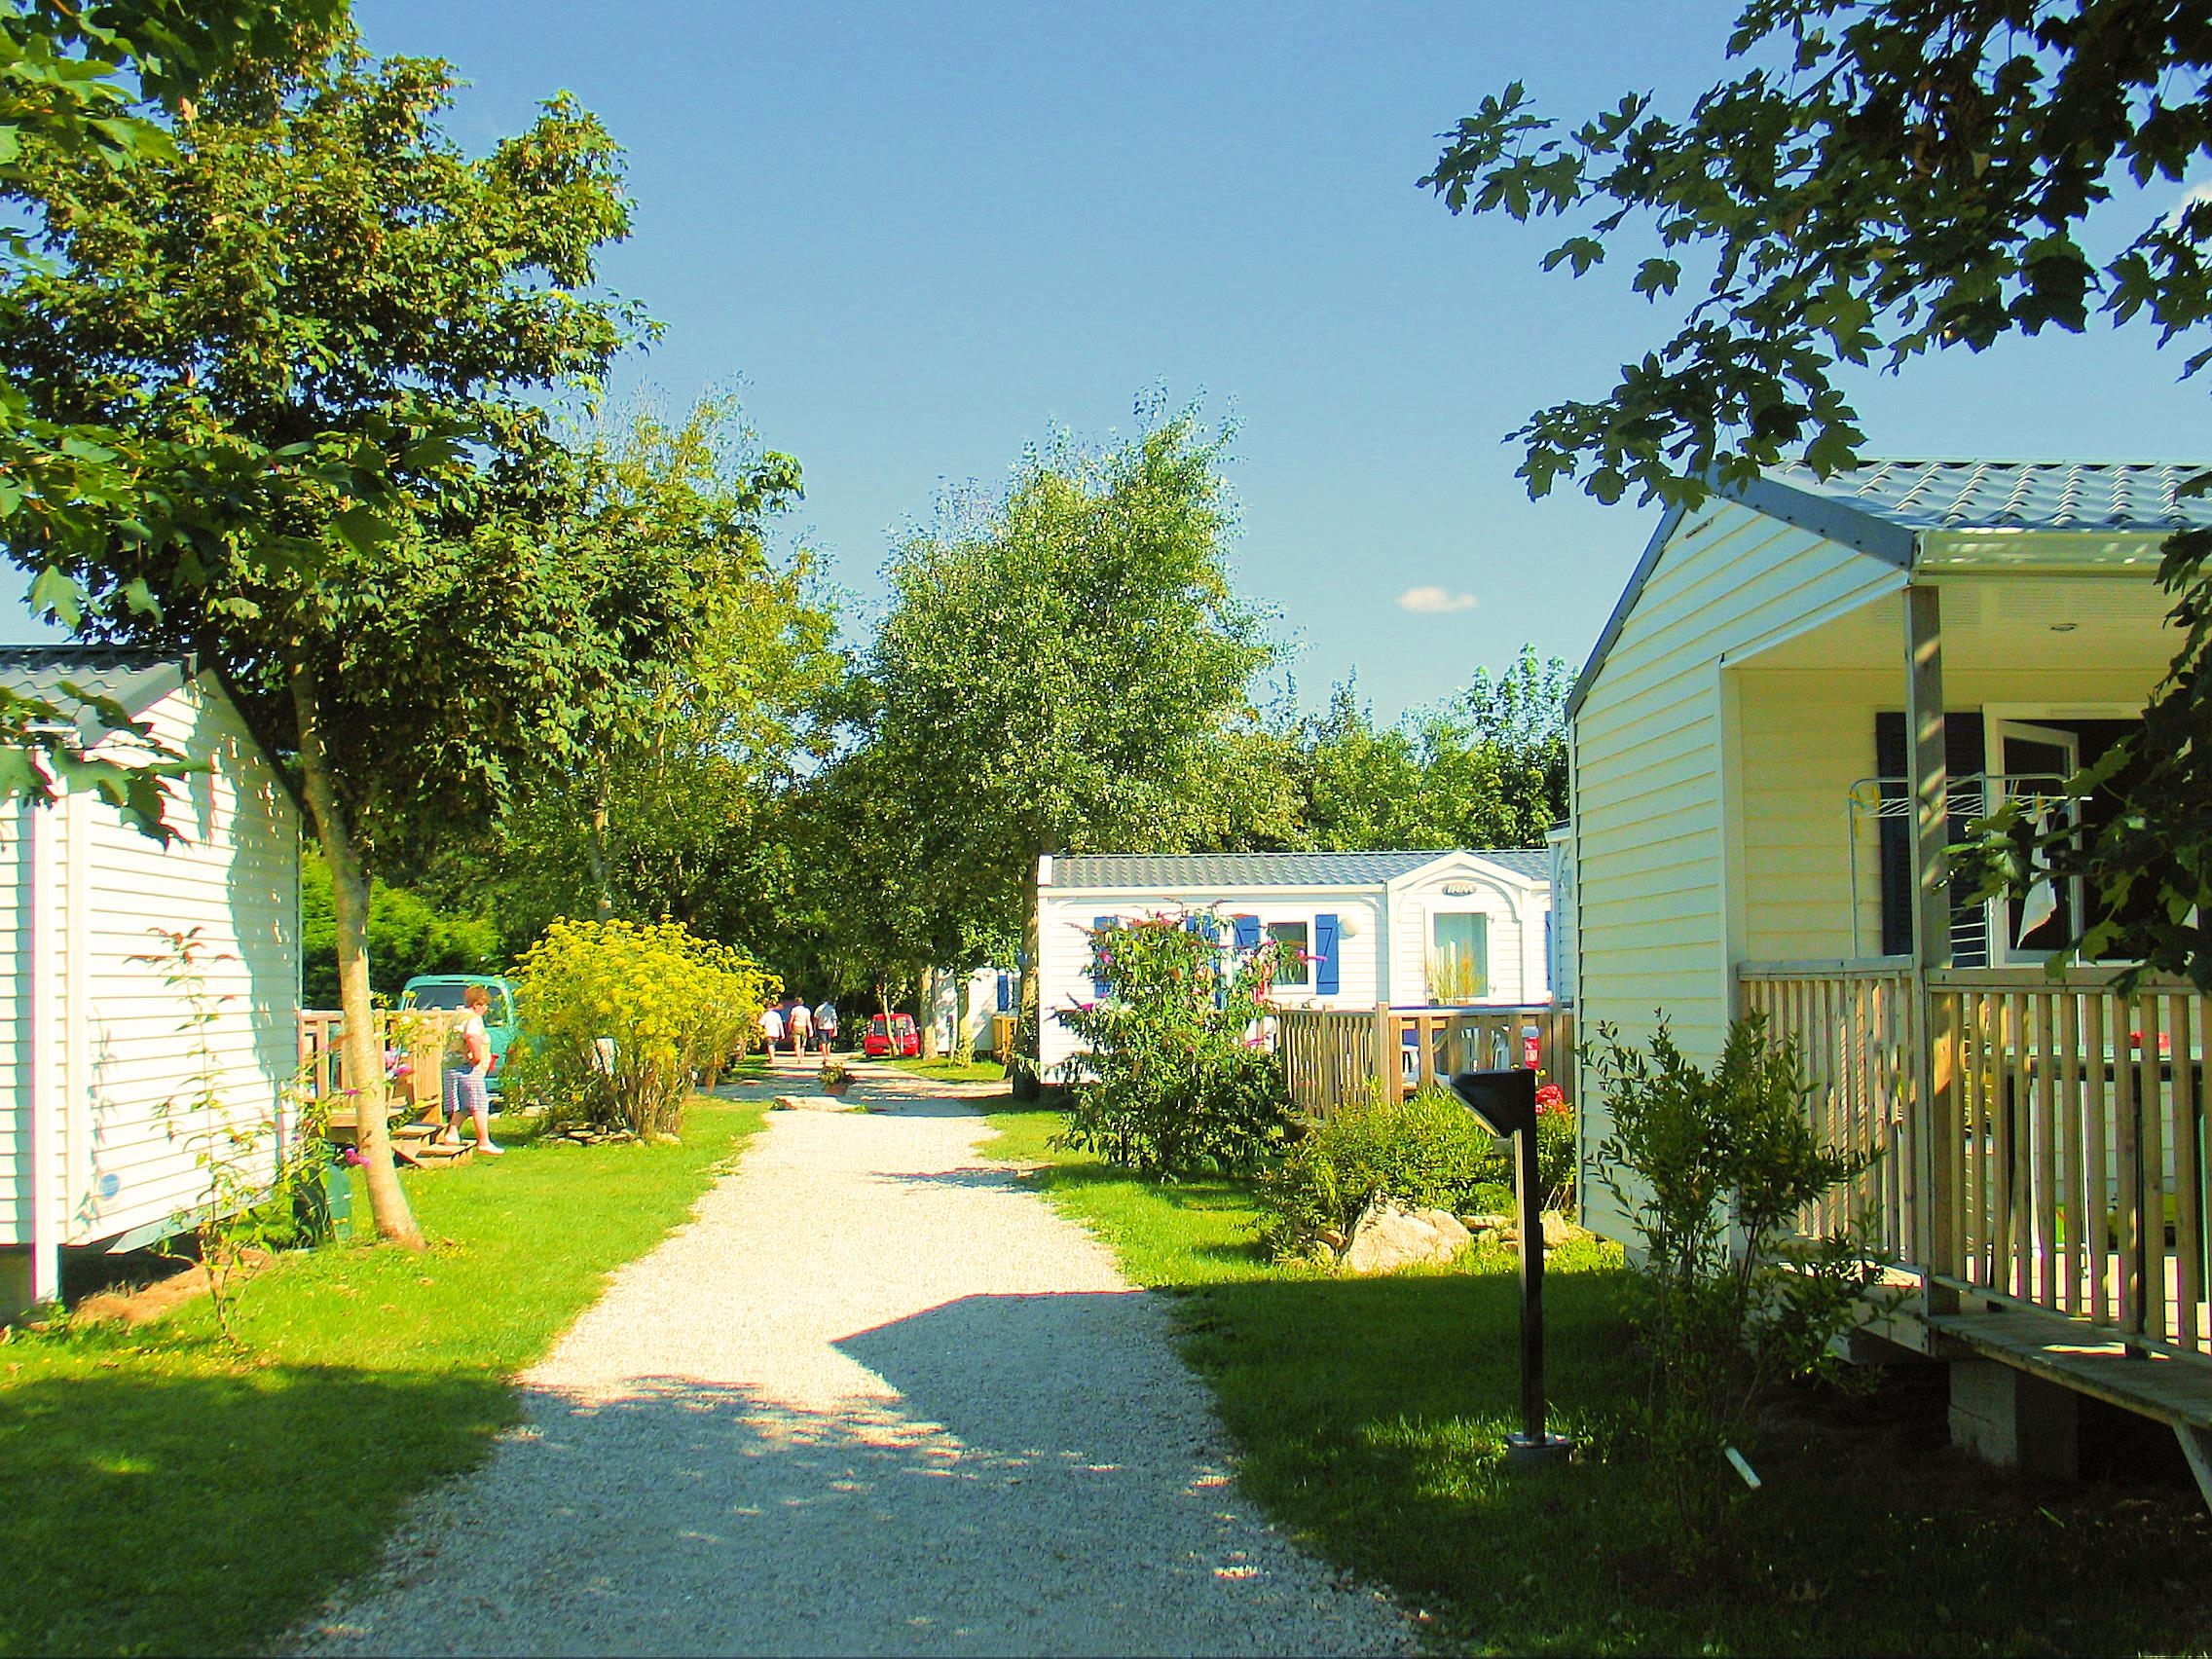 Camping les Genets, Penmarch, Finistère